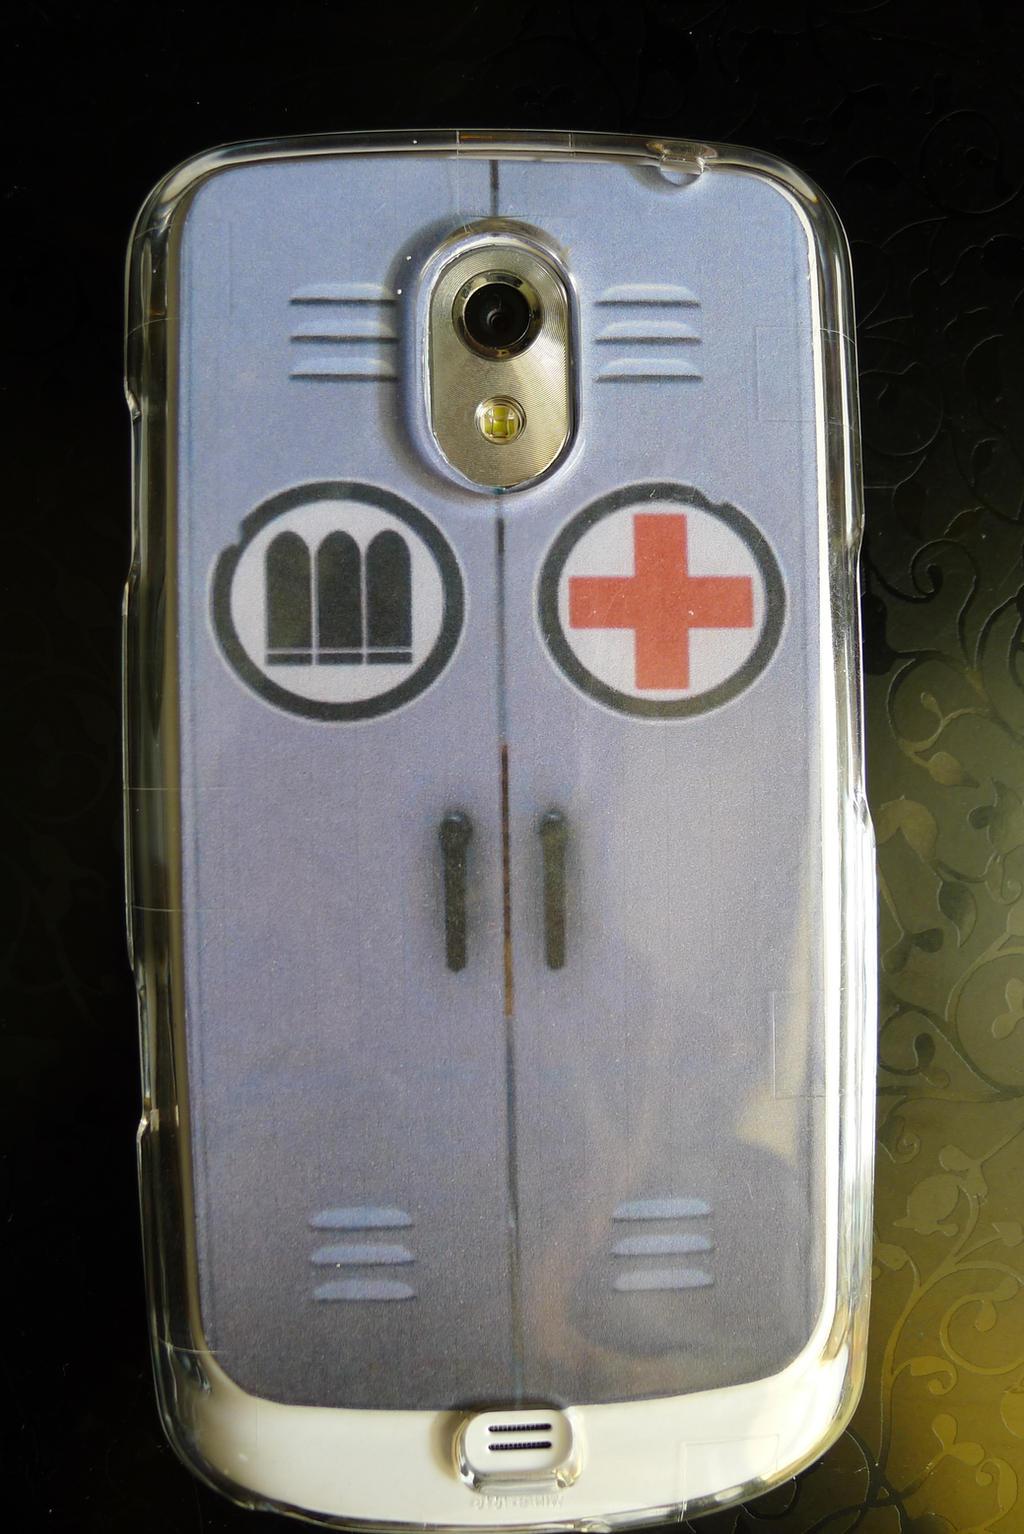 ... TF2 Resupply Cabinet Phone Case By Pcanjjaxdcd